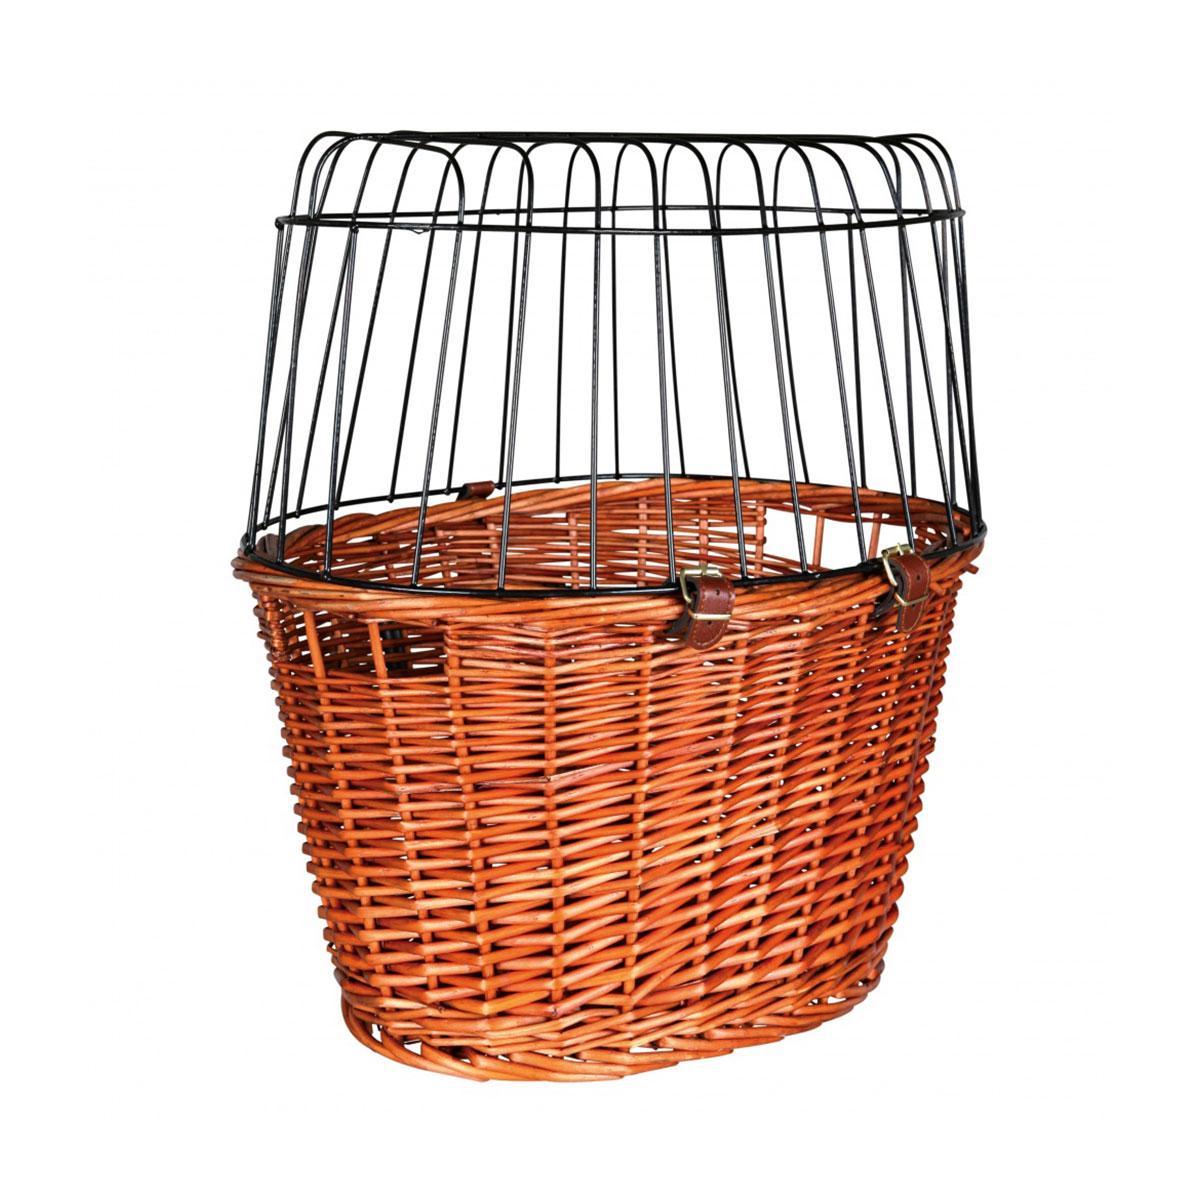 trixie fahrradkorb mit gitter g nstig kaufen bei zooroyal. Black Bedroom Furniture Sets. Home Design Ideas